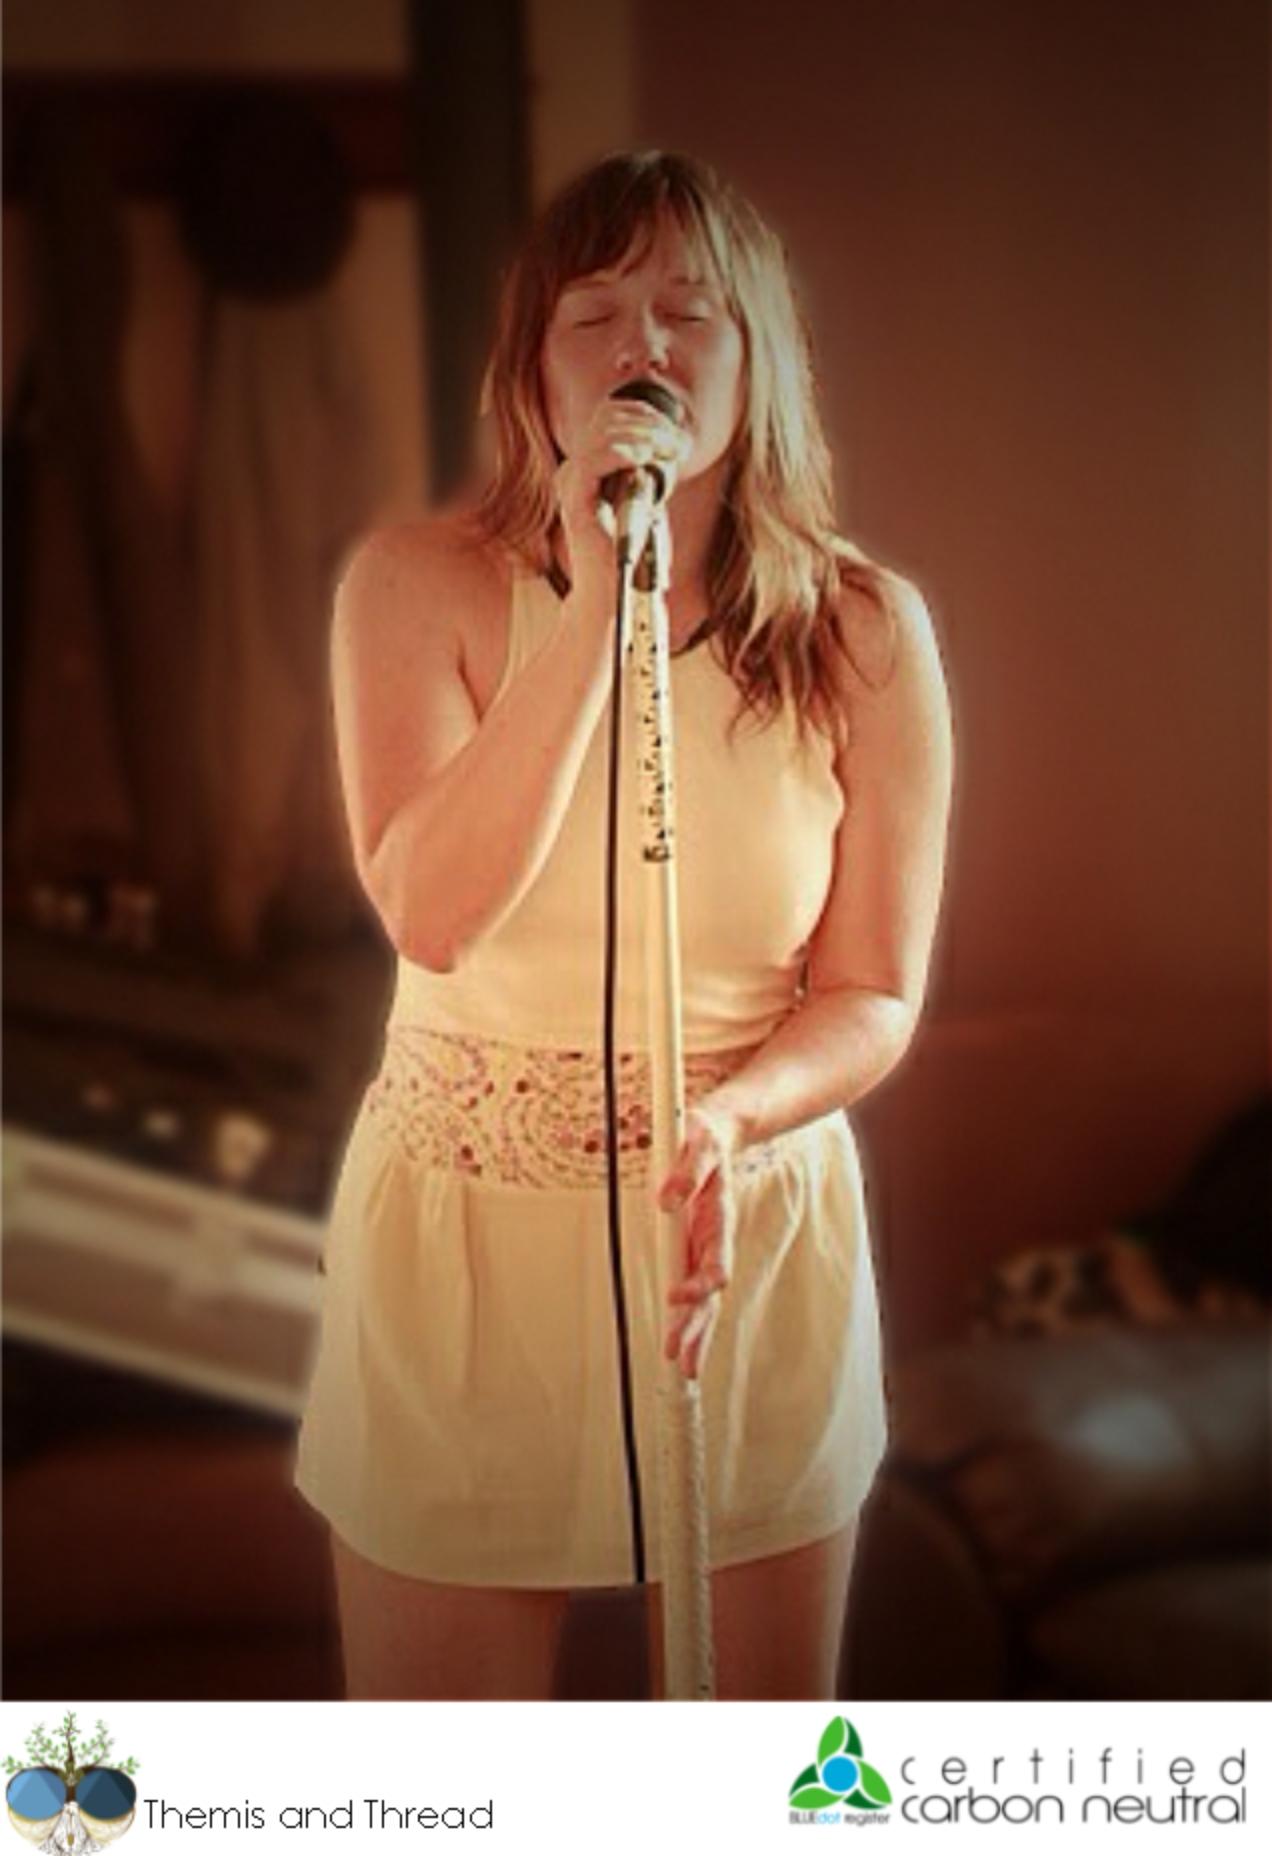 Themis Maddy Singing.jpg